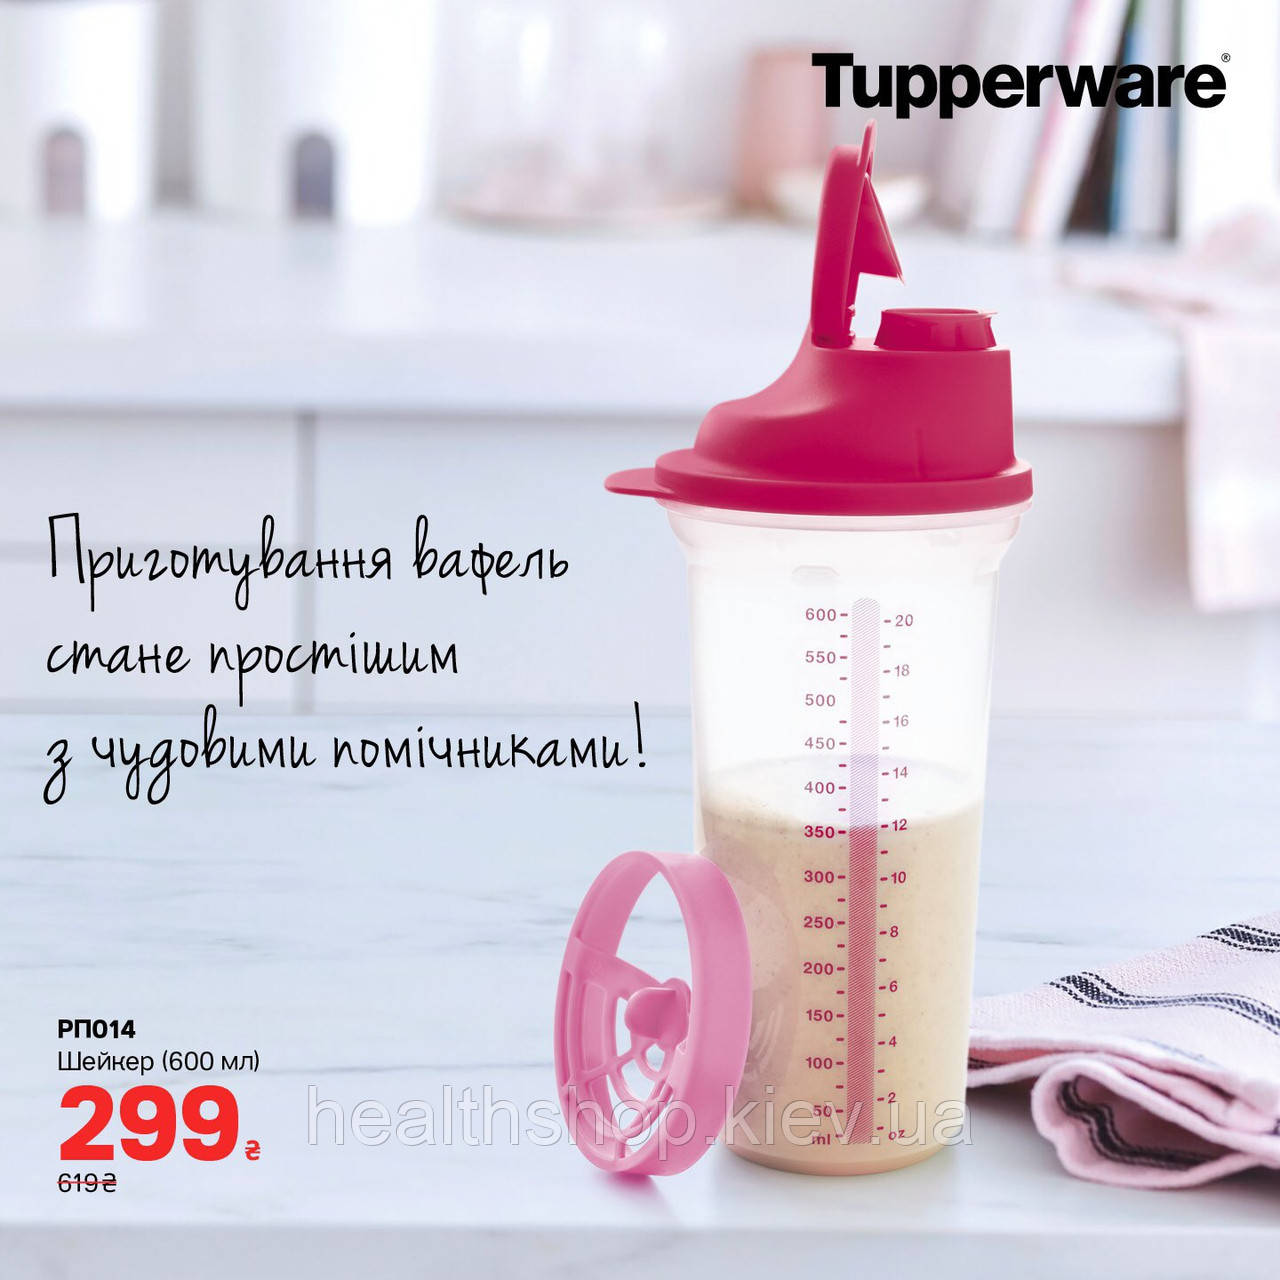 Шейкер (600 мл) Tupperware